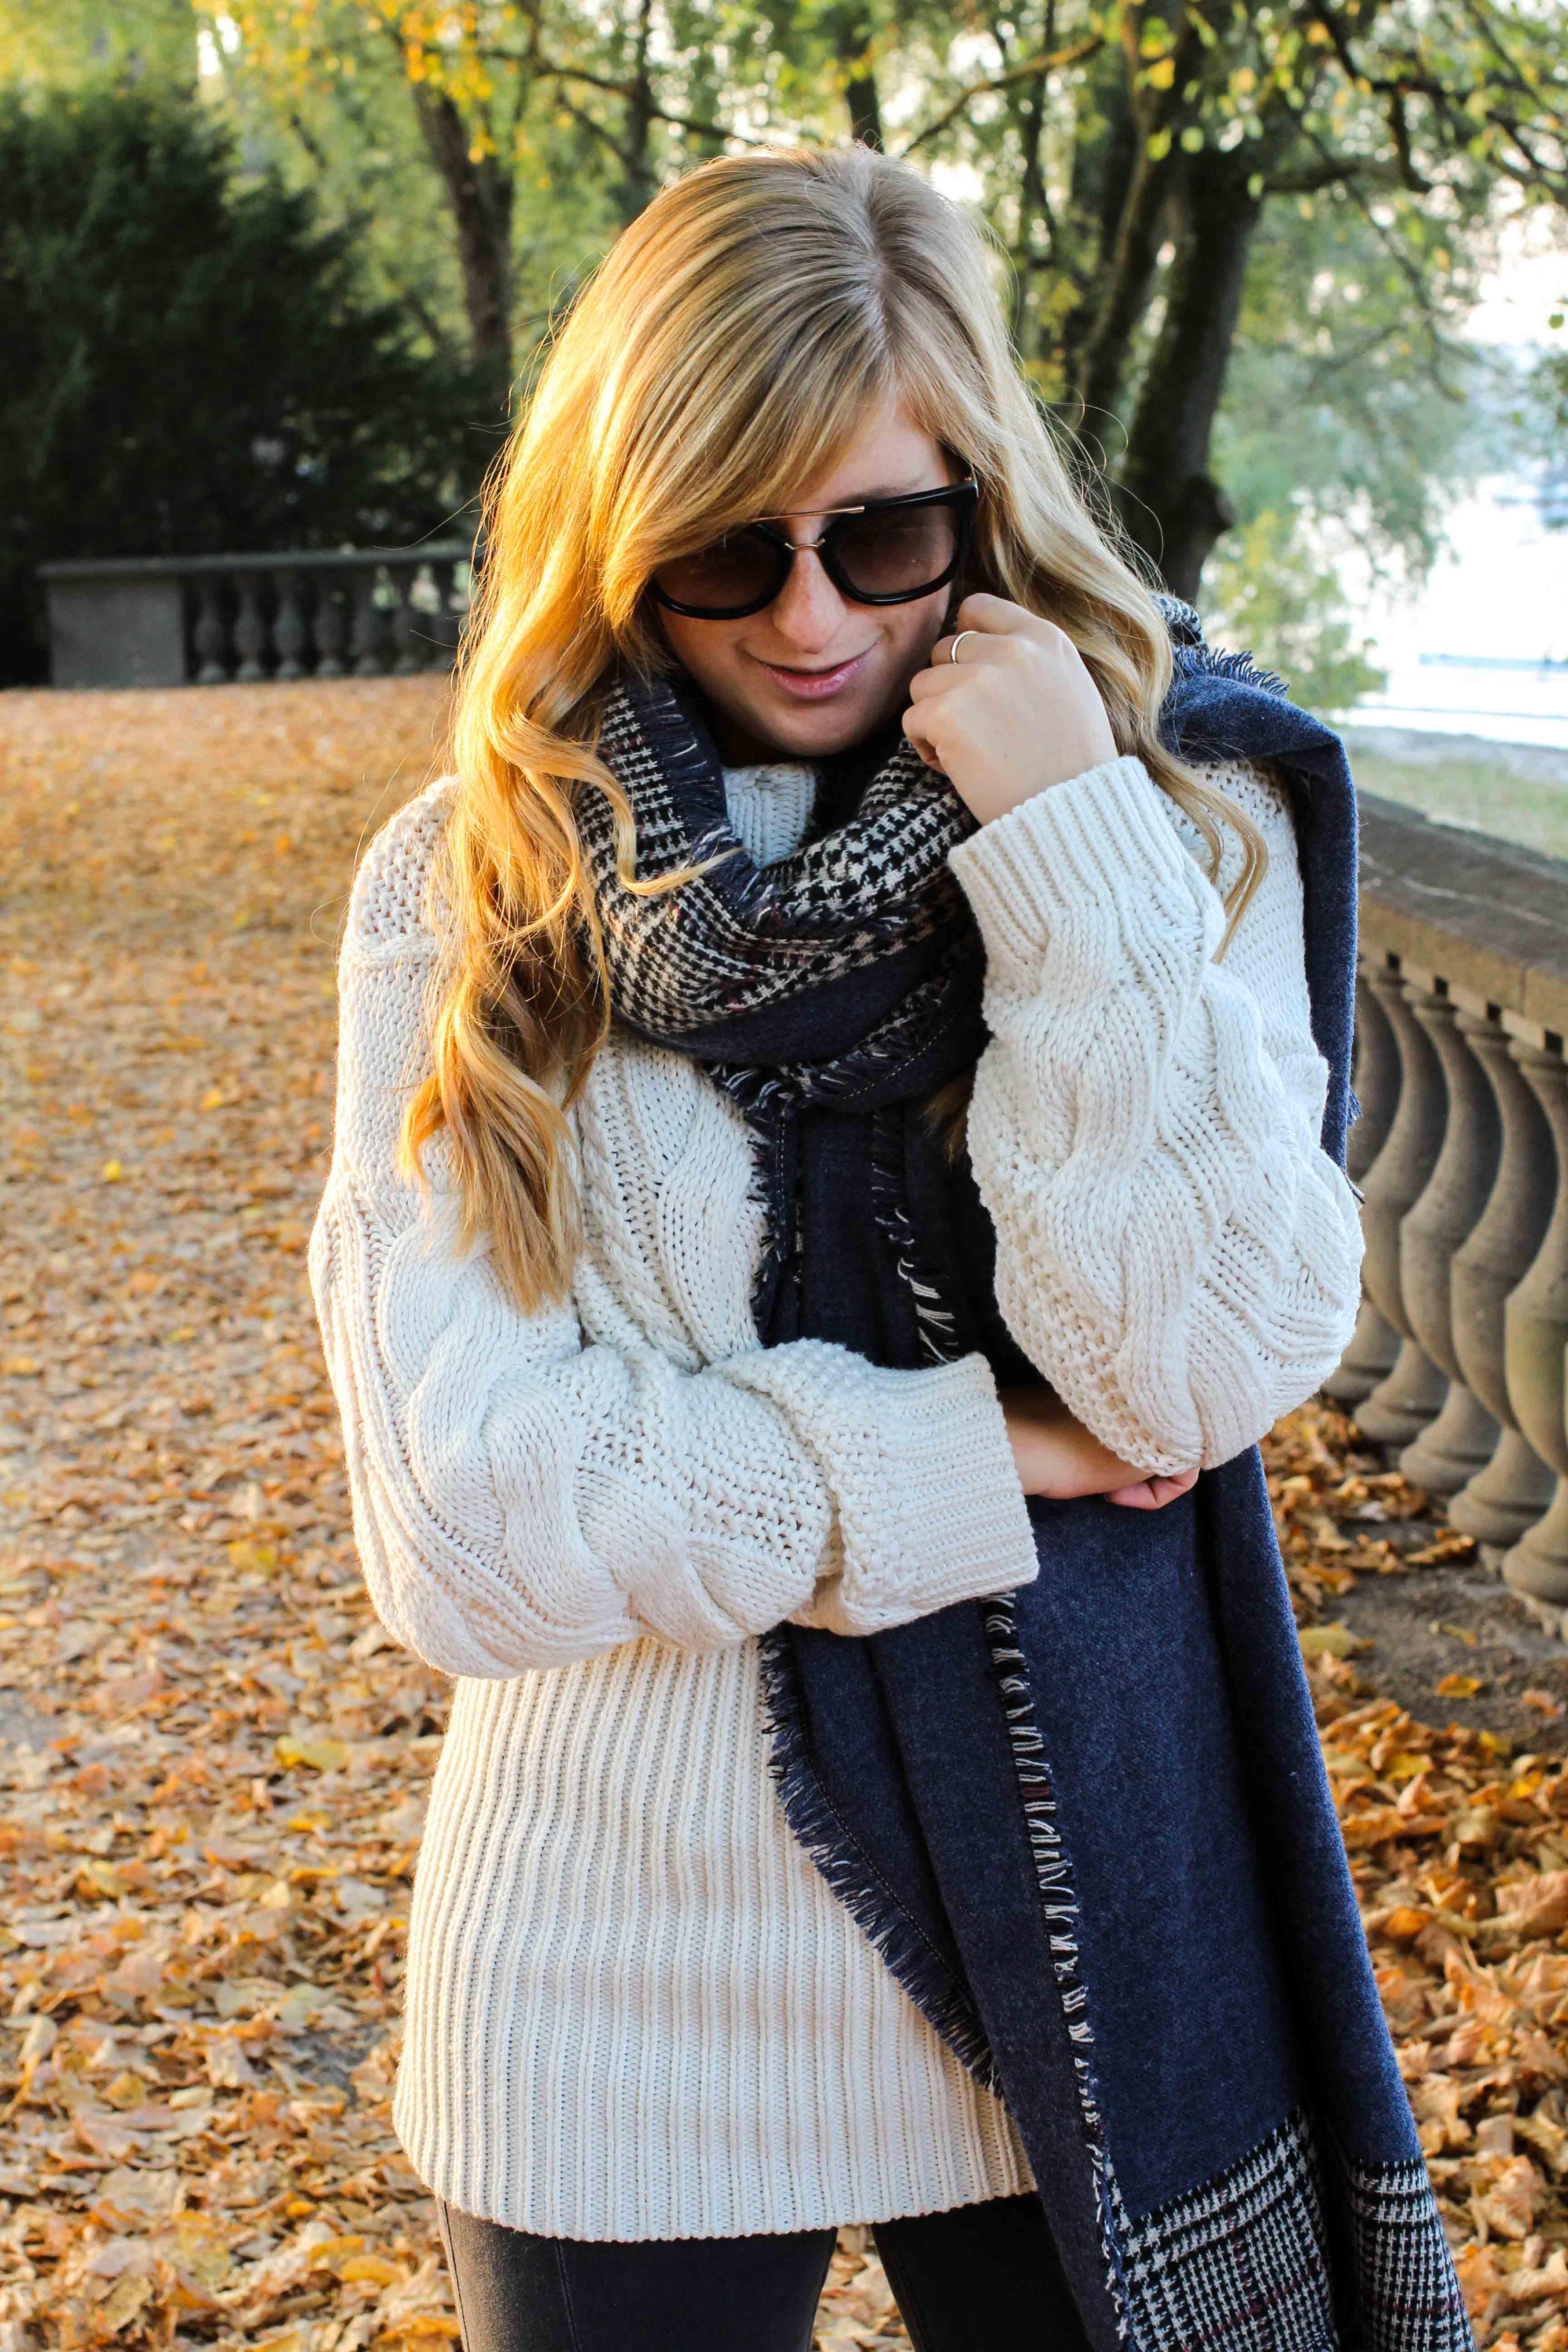 schönste Outfitfotos Herbst Foto Herbstbilder Karo Schal Herbst Must Have Trends 2019 Herbstoutfit 9